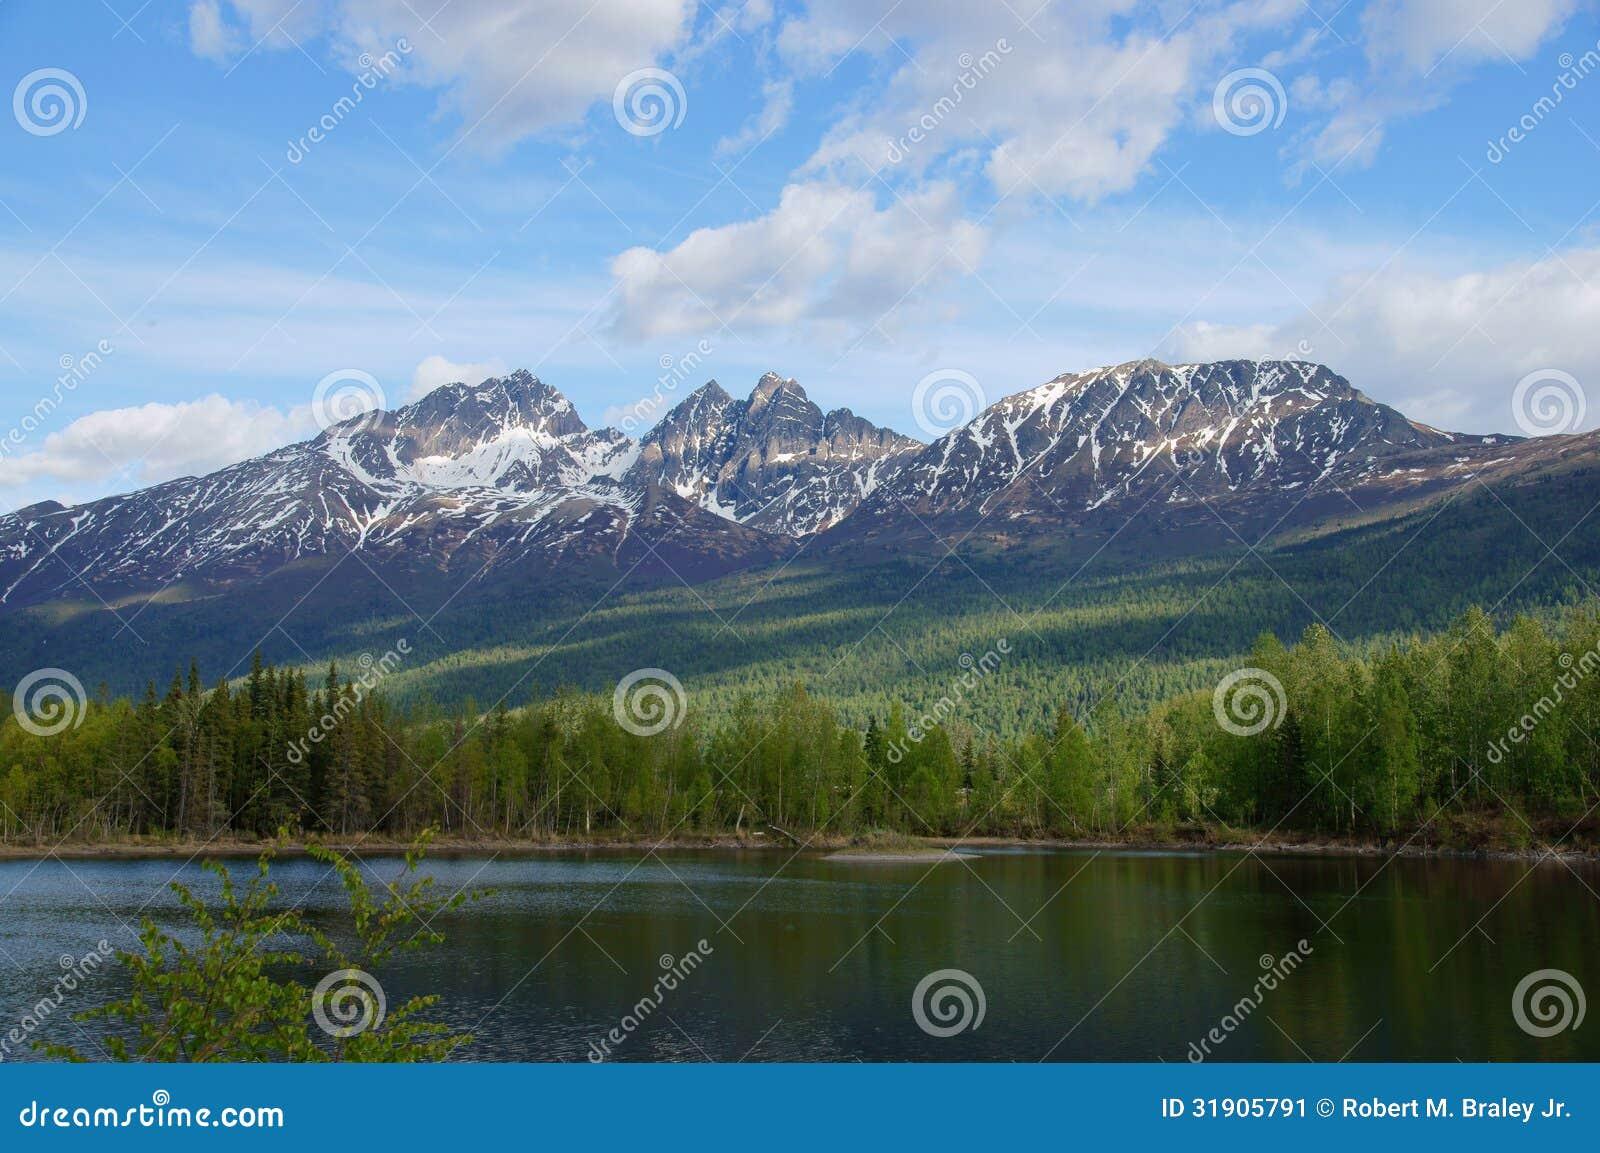 Alaska Mountains and Lake, Palmer Hays Flats